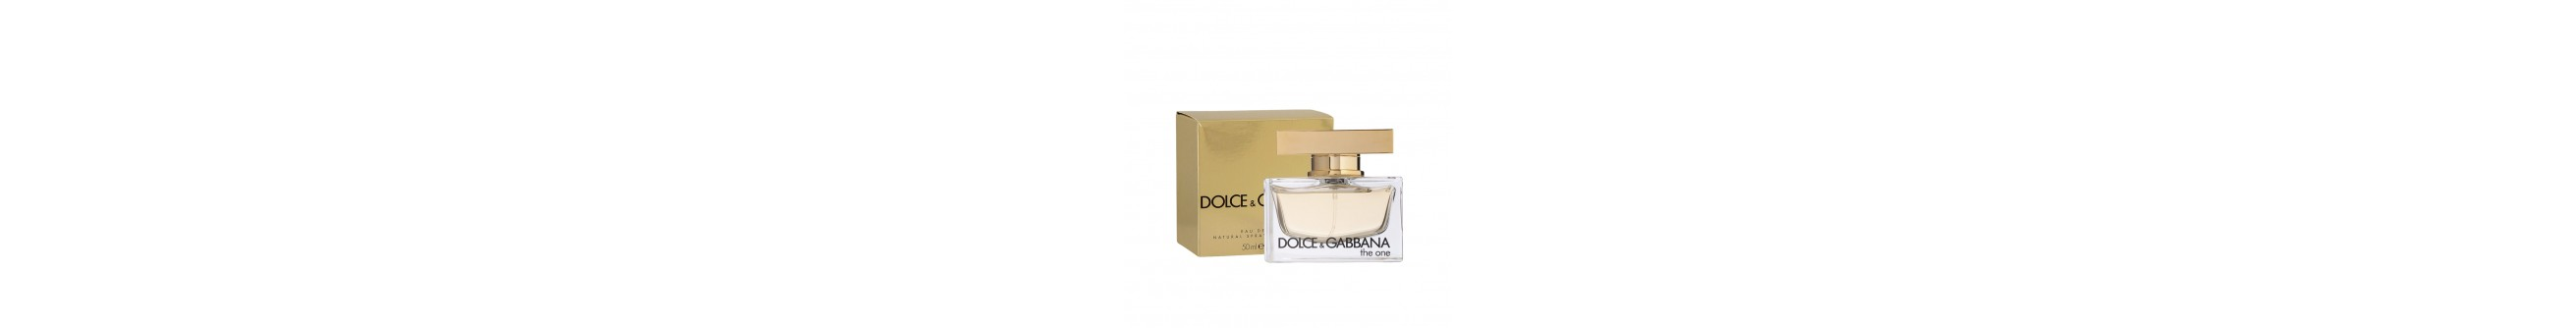 The One - Dolce Gabbana (άρωμα τύπου)